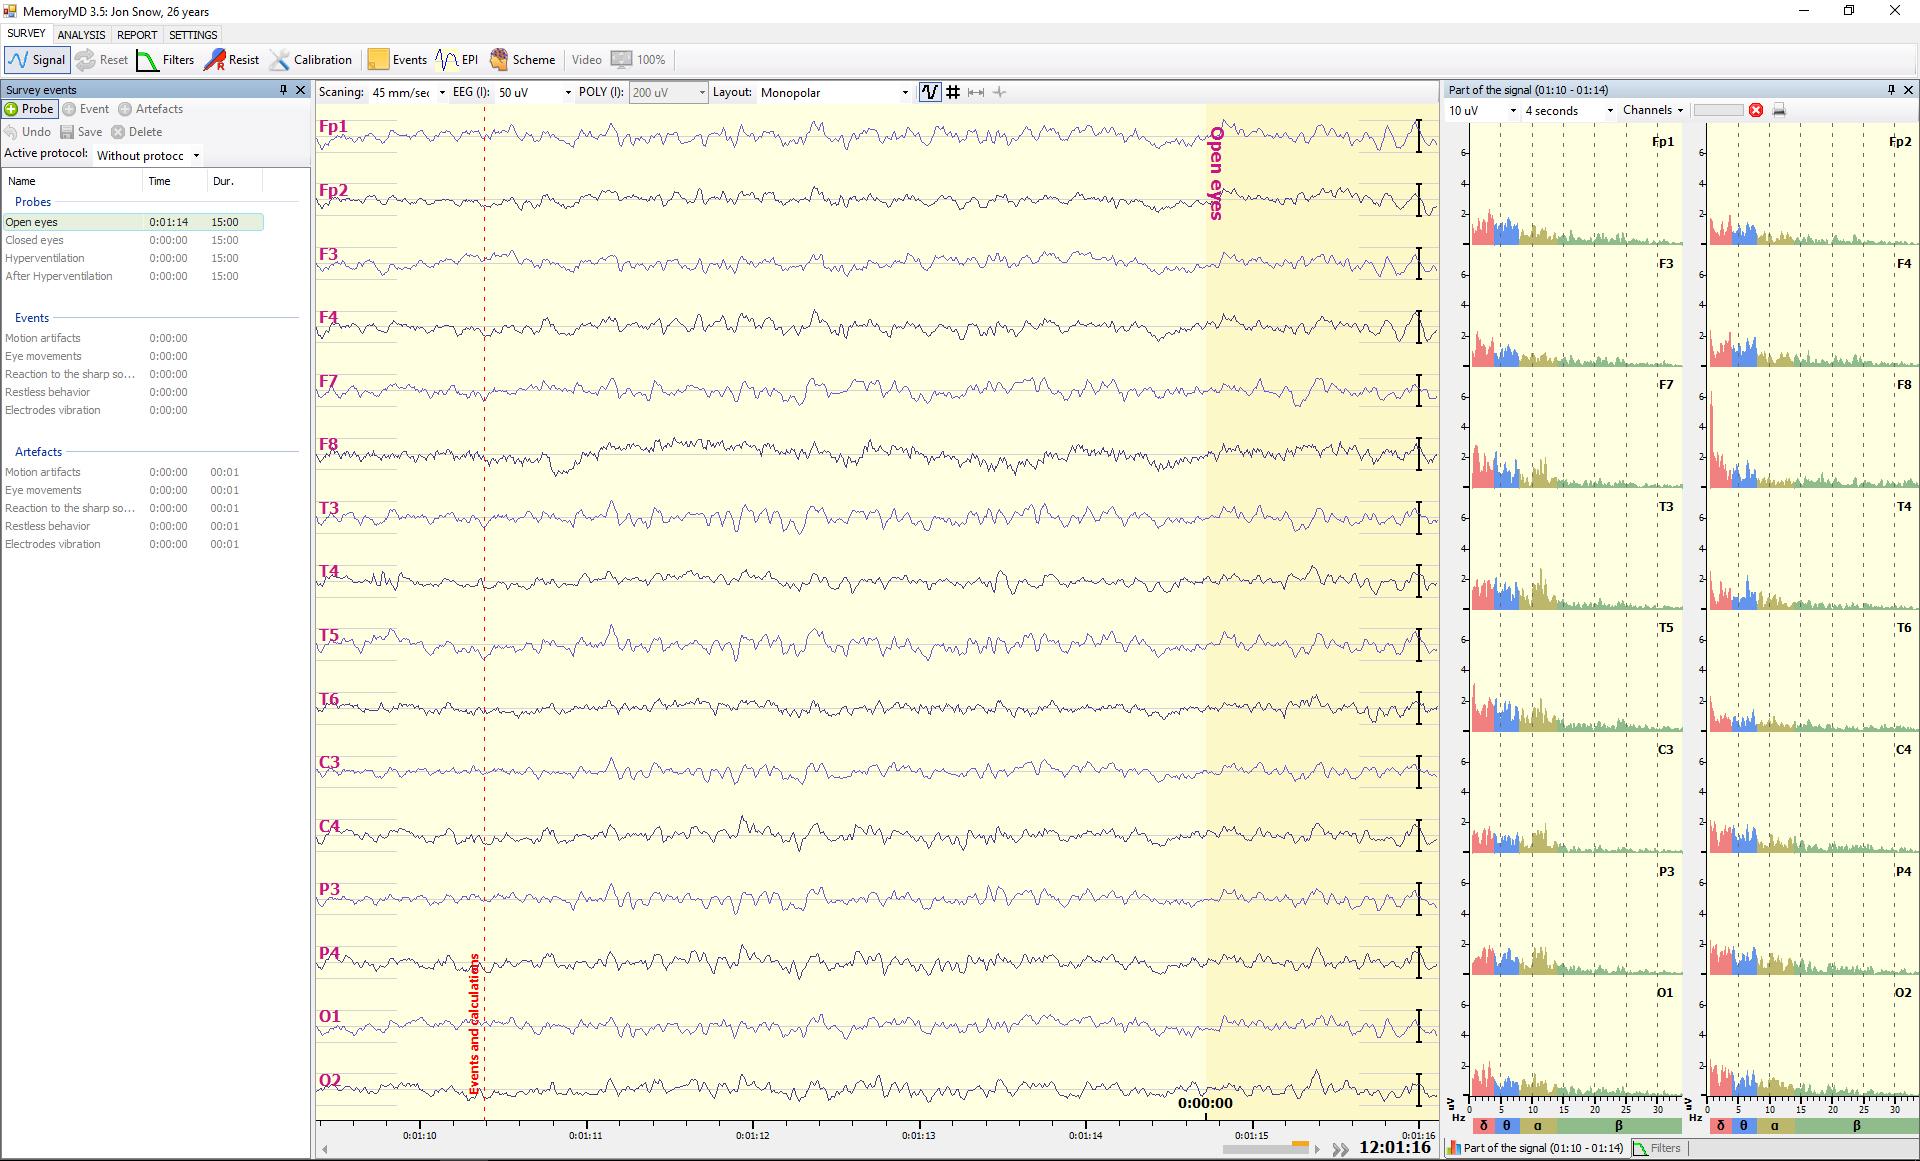 Spectrum of EEG signal